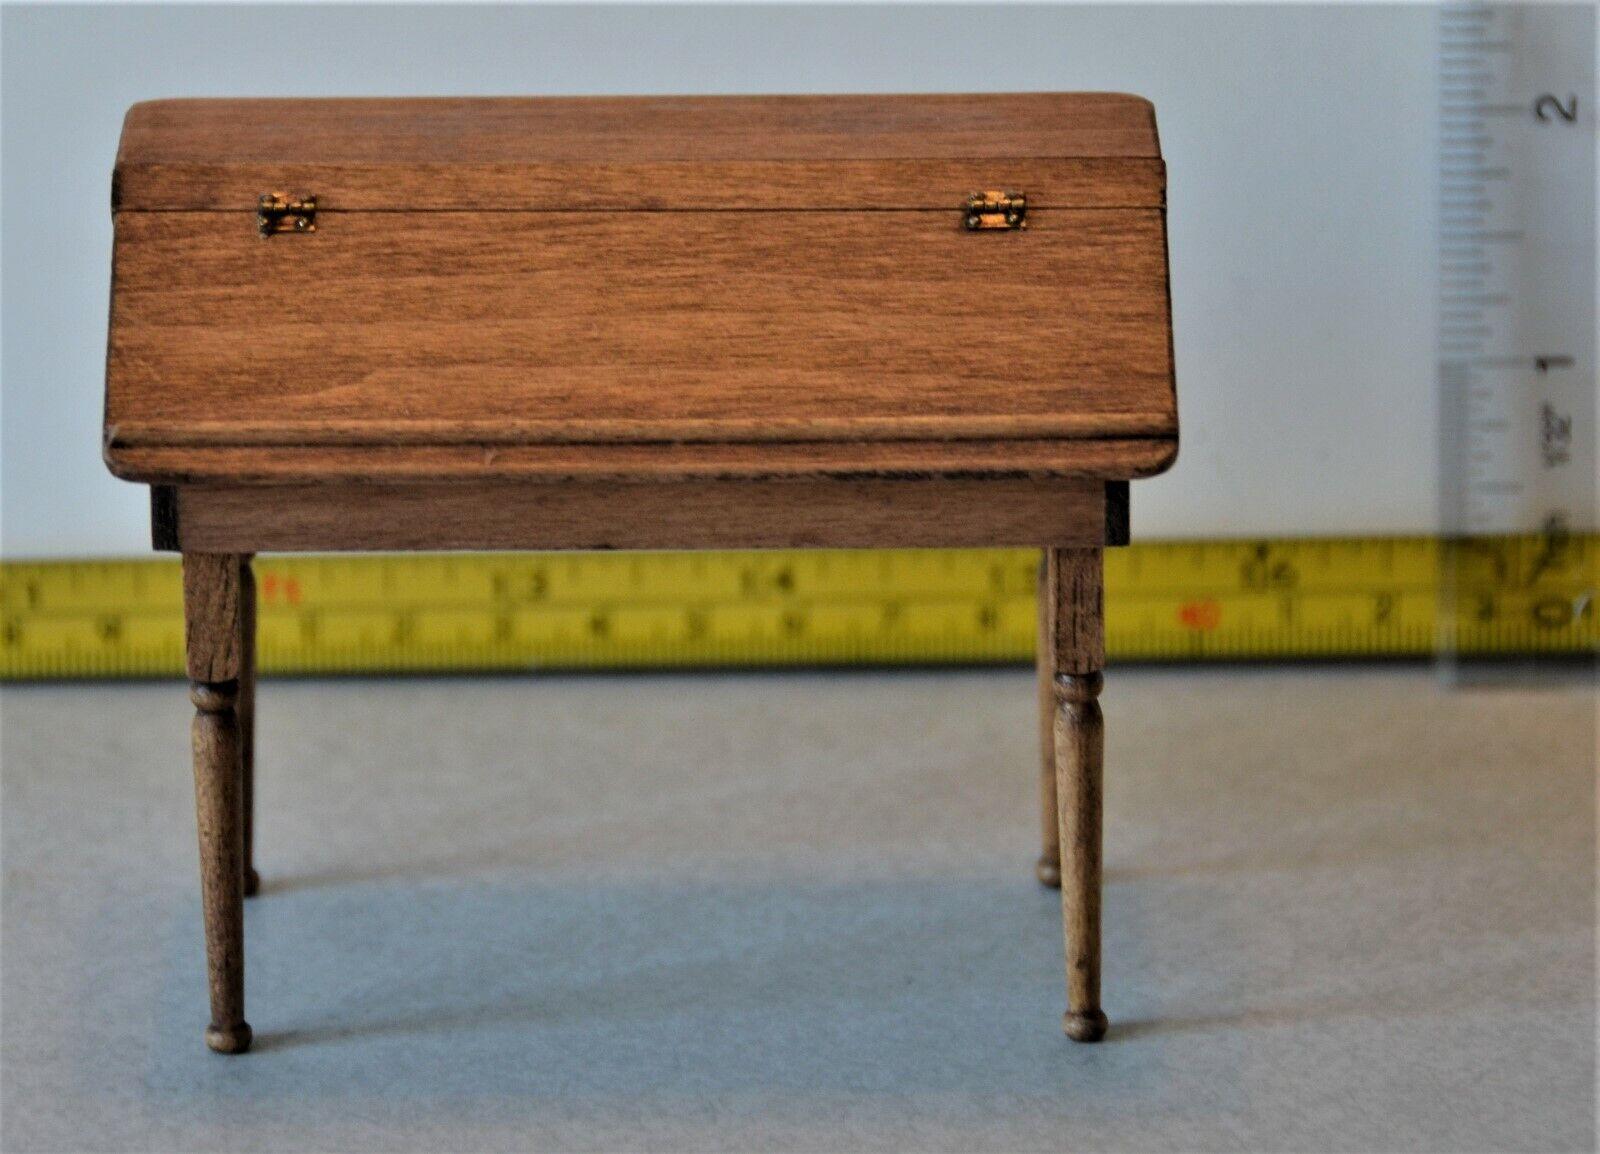 Artisan CJ's Flip top Desk Signed 1 12 Handmade 2001 voitureolyn Wilson & Jean Byer